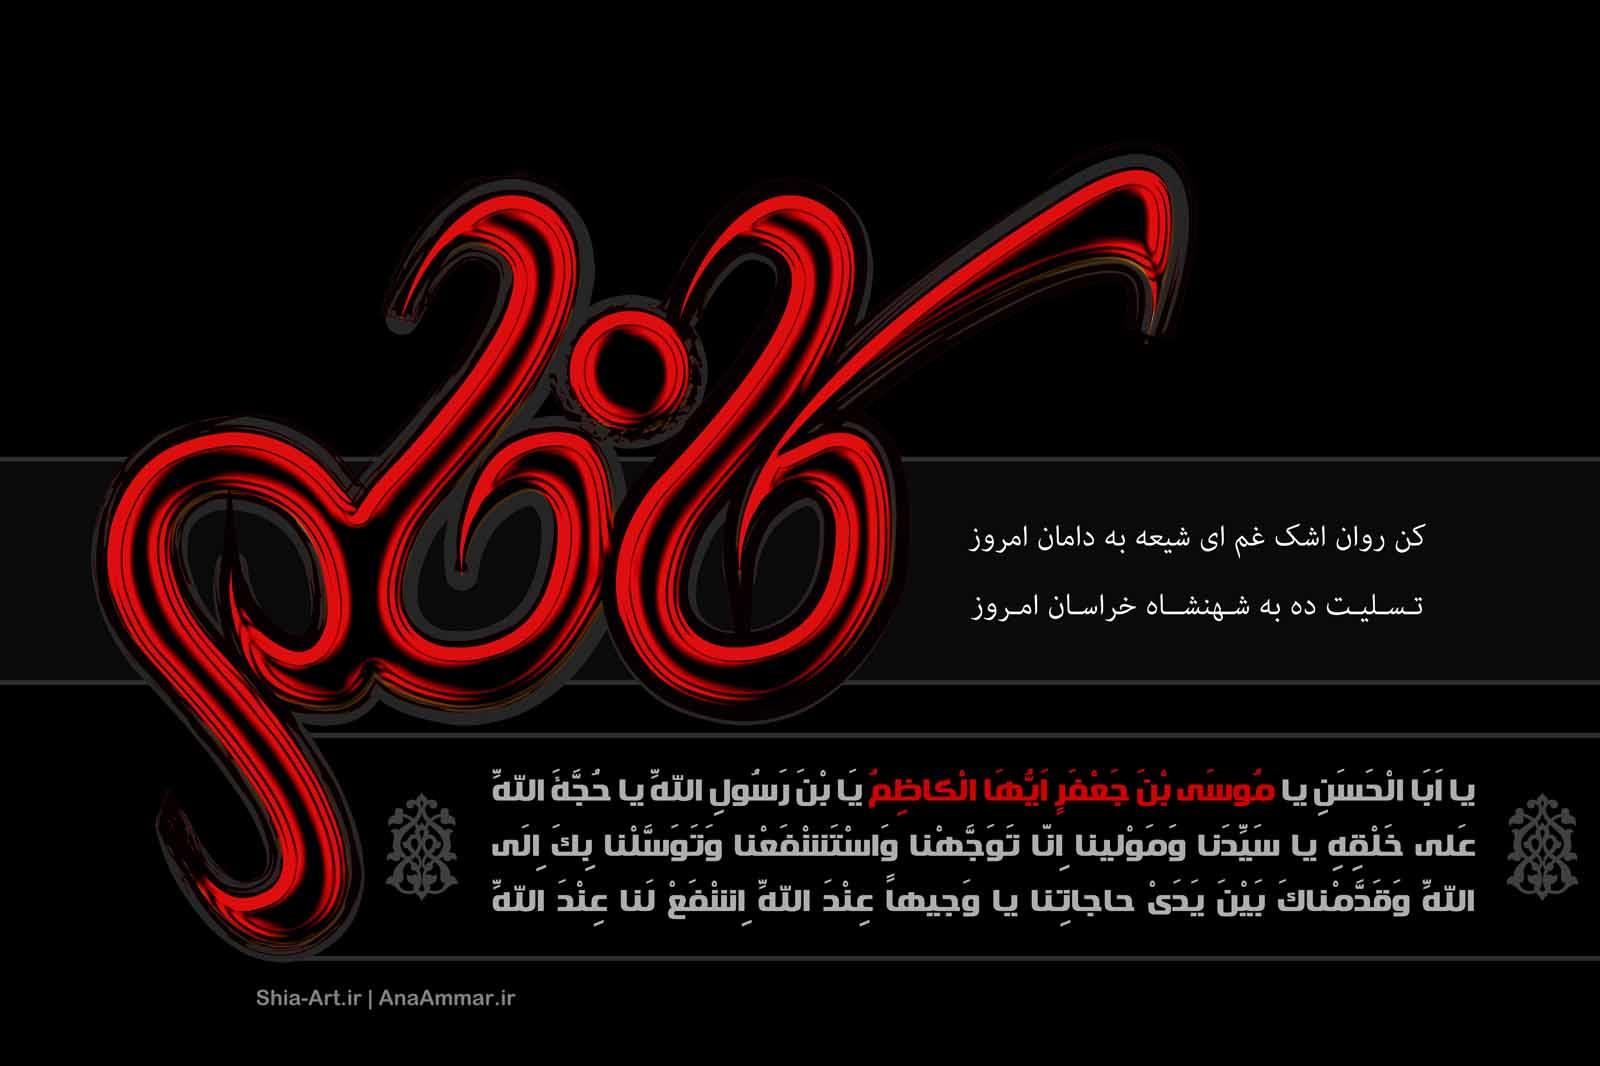 طرح بنر و پوستر شهادت امام موسی کاظم (علیه السلام)